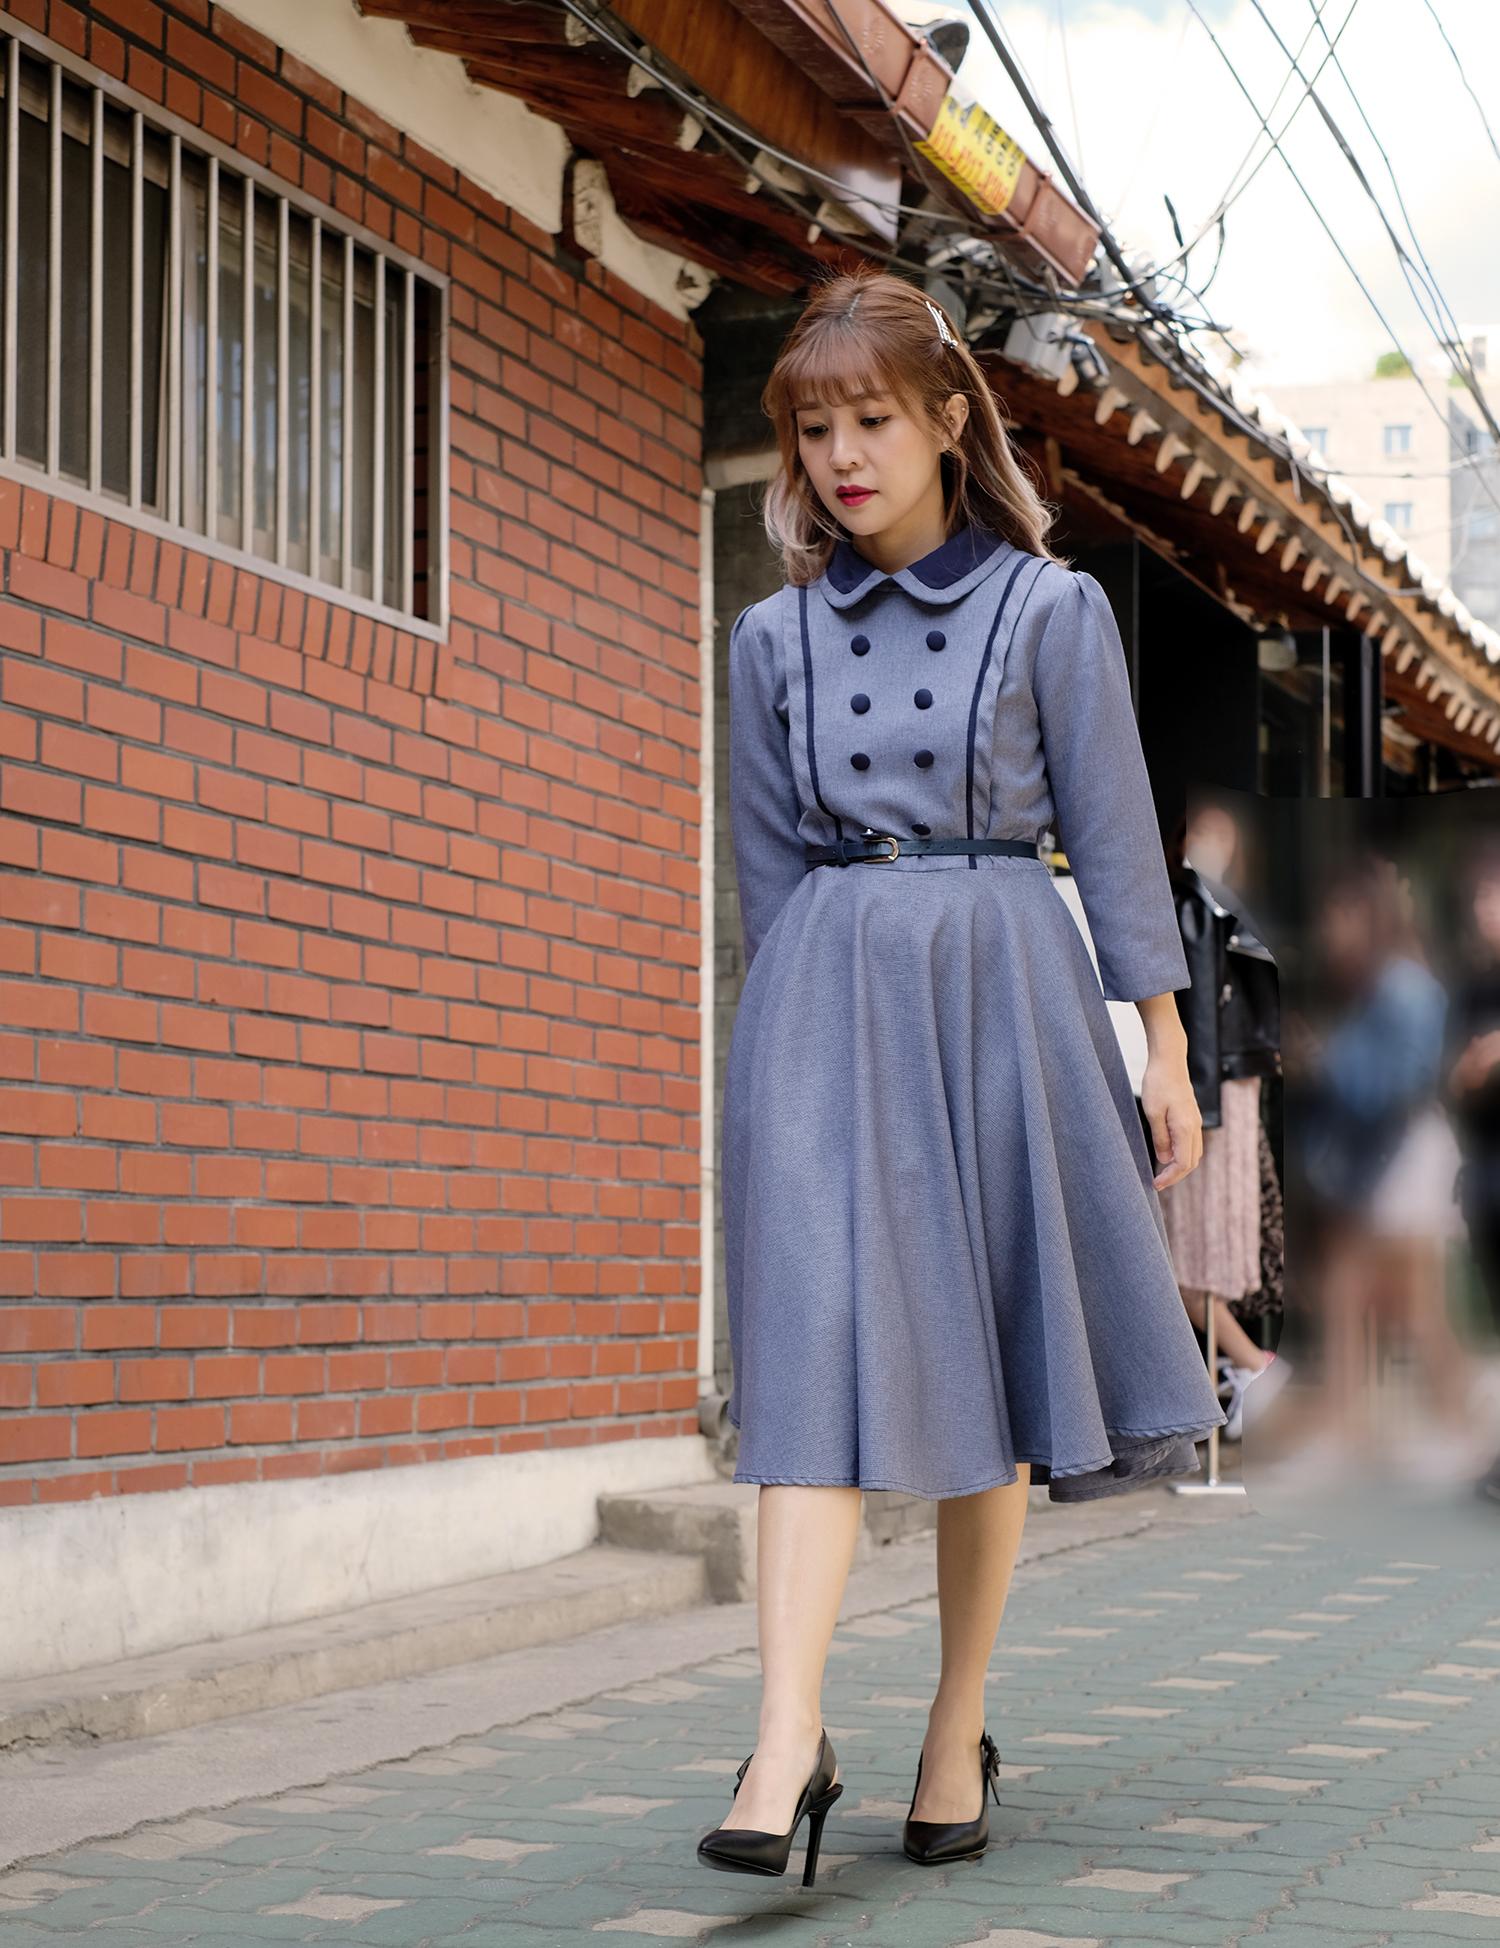 Vintage Clothes Rental Seoul Korea Ikseon Boutique Hotel Del Luna Inspired 2